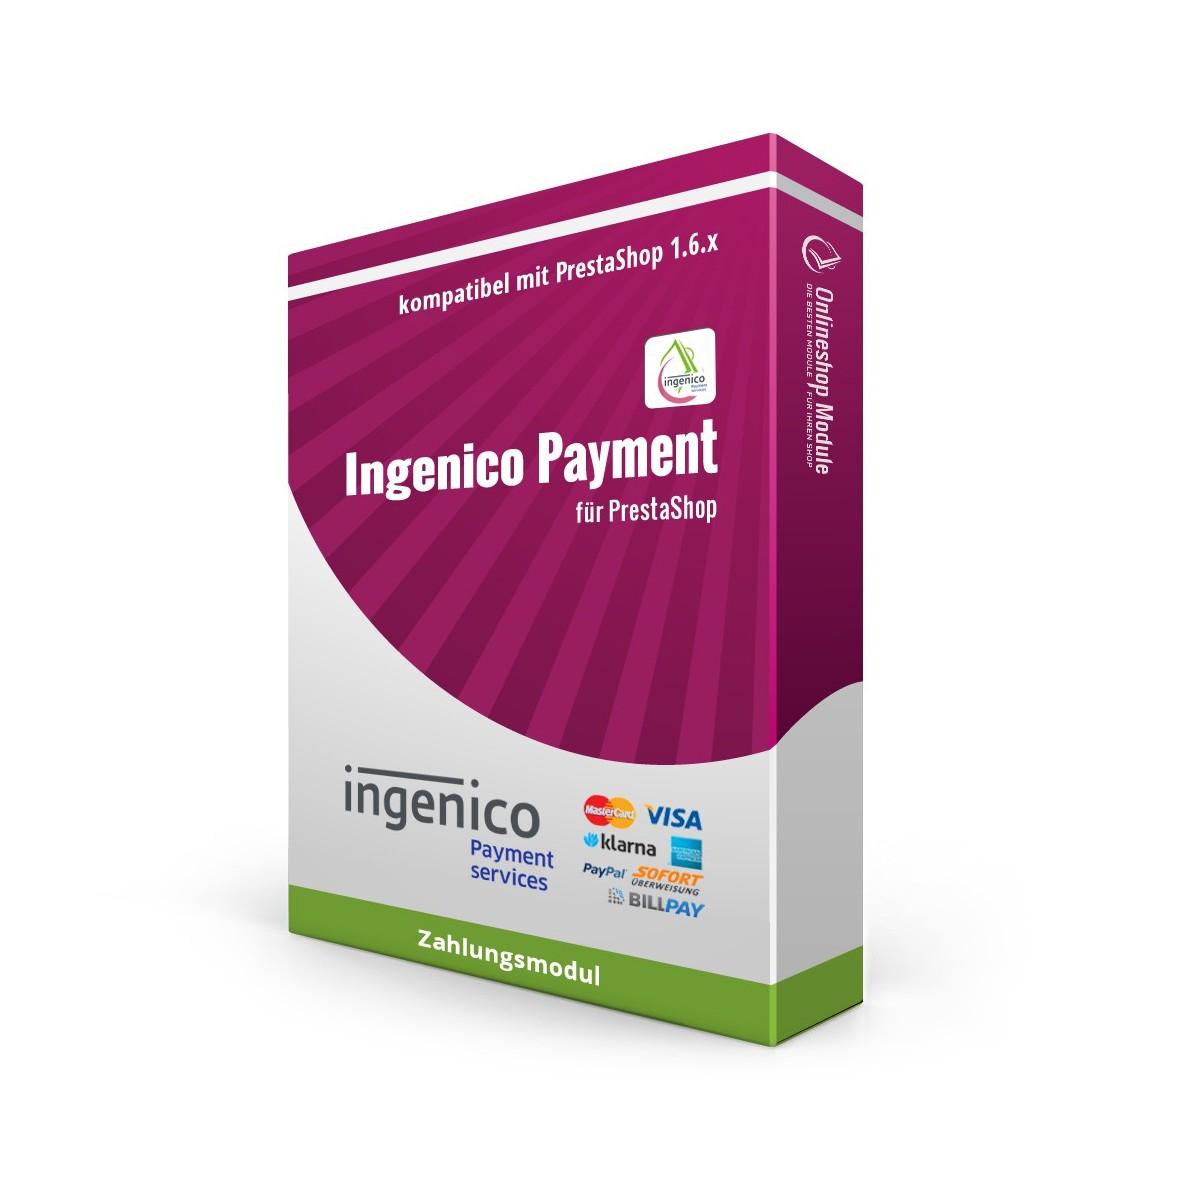 Ingenico Kreditkarte, Zahlungsmodul